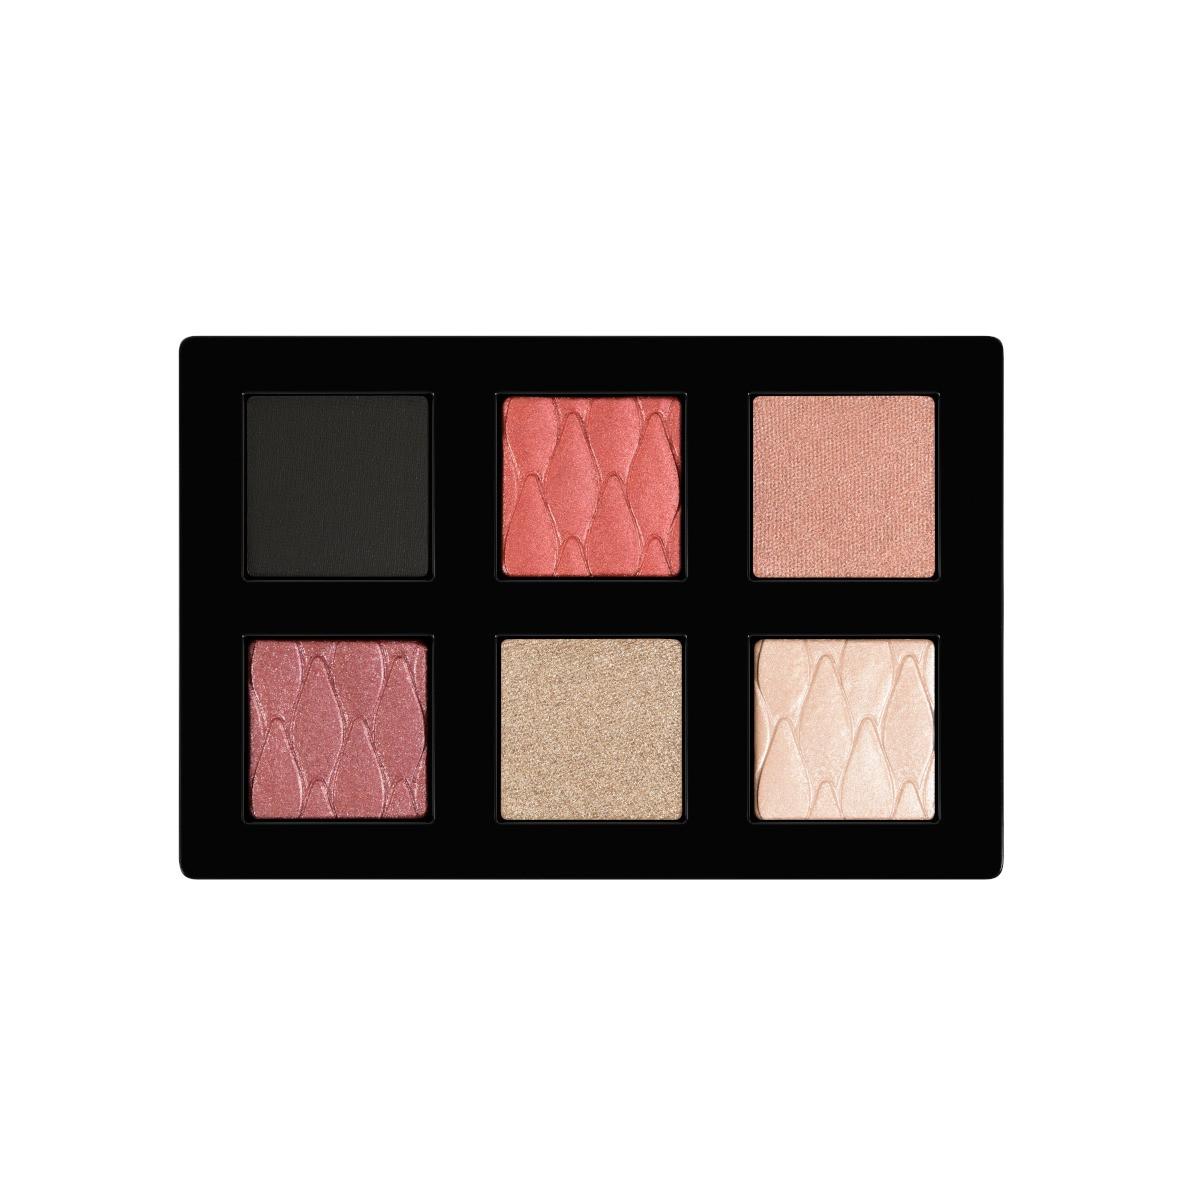 Beauty - Rouge Follies - Christian Louboutin